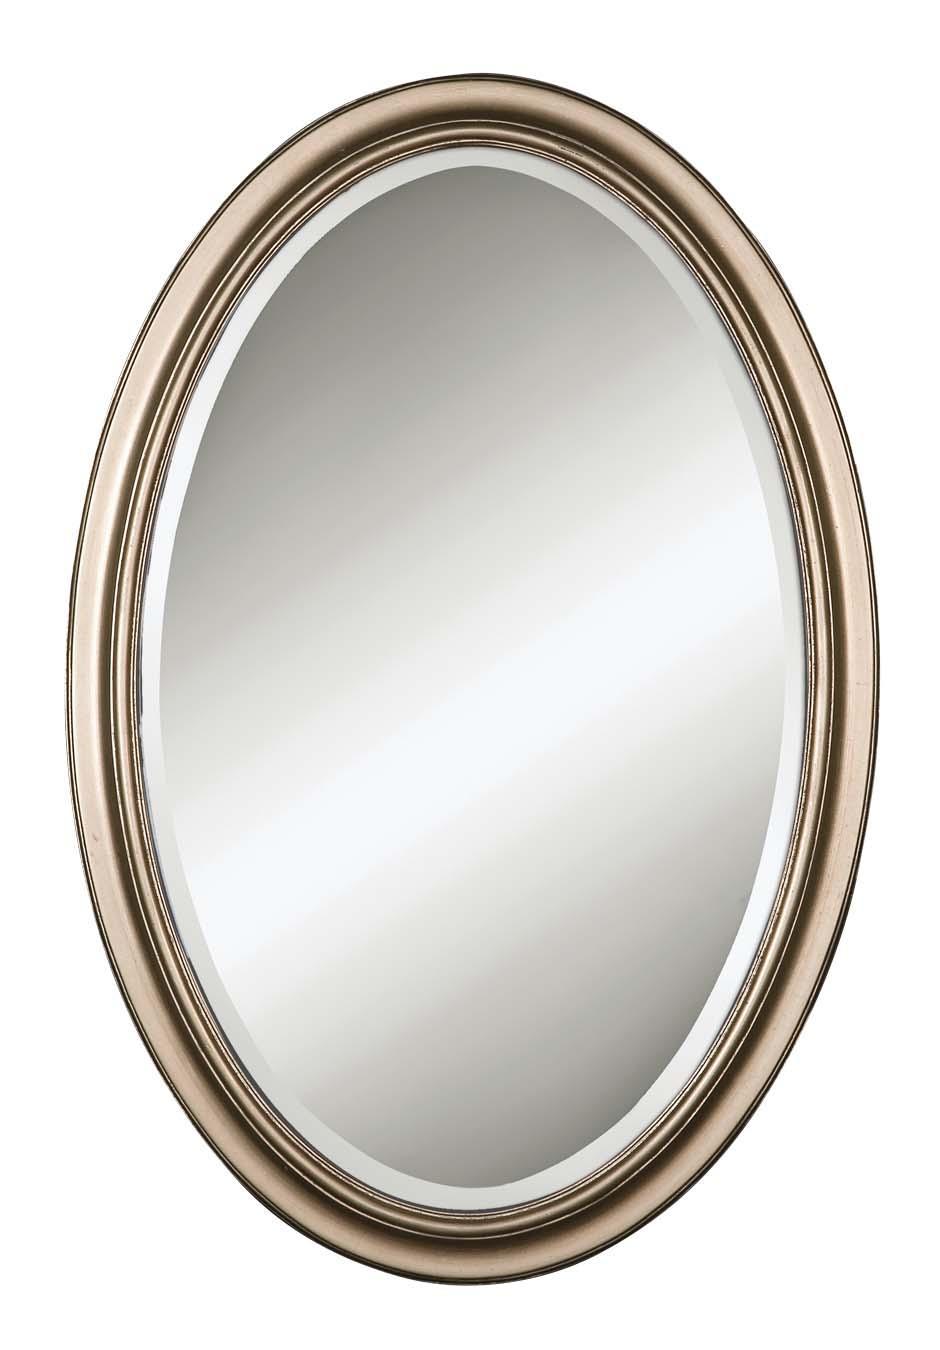 Uttermost Mirrors Petite Manhattan Oval Champagne SilverU - Item Number: 08646 B